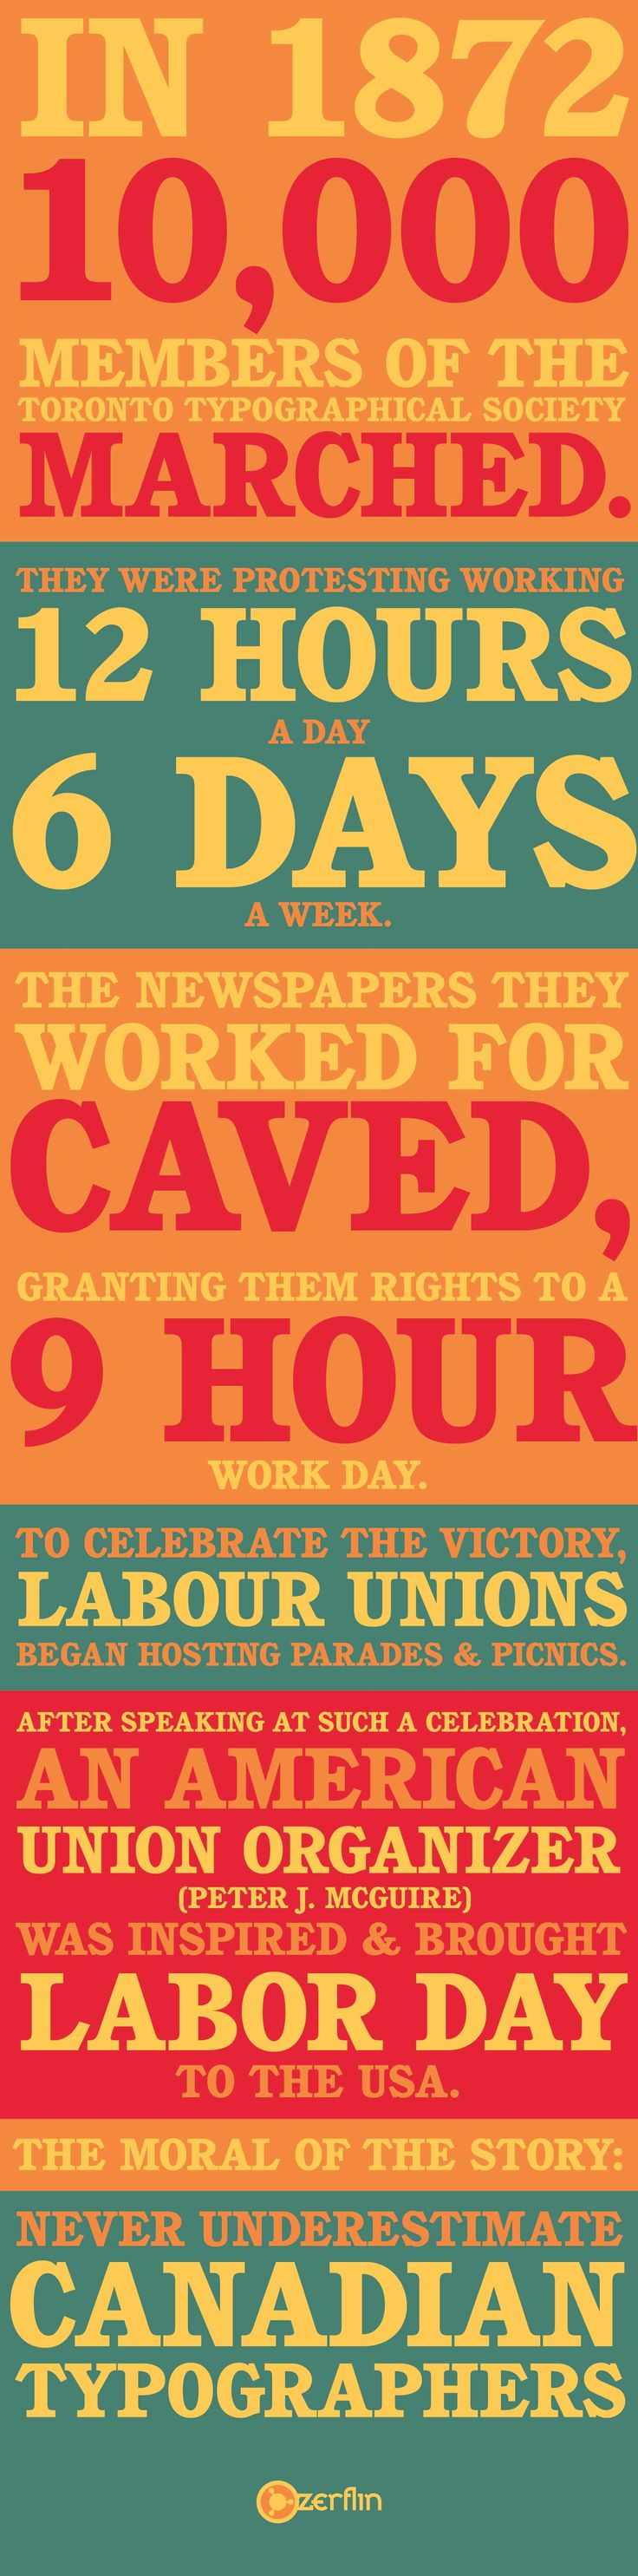 The Origins of Labor Day